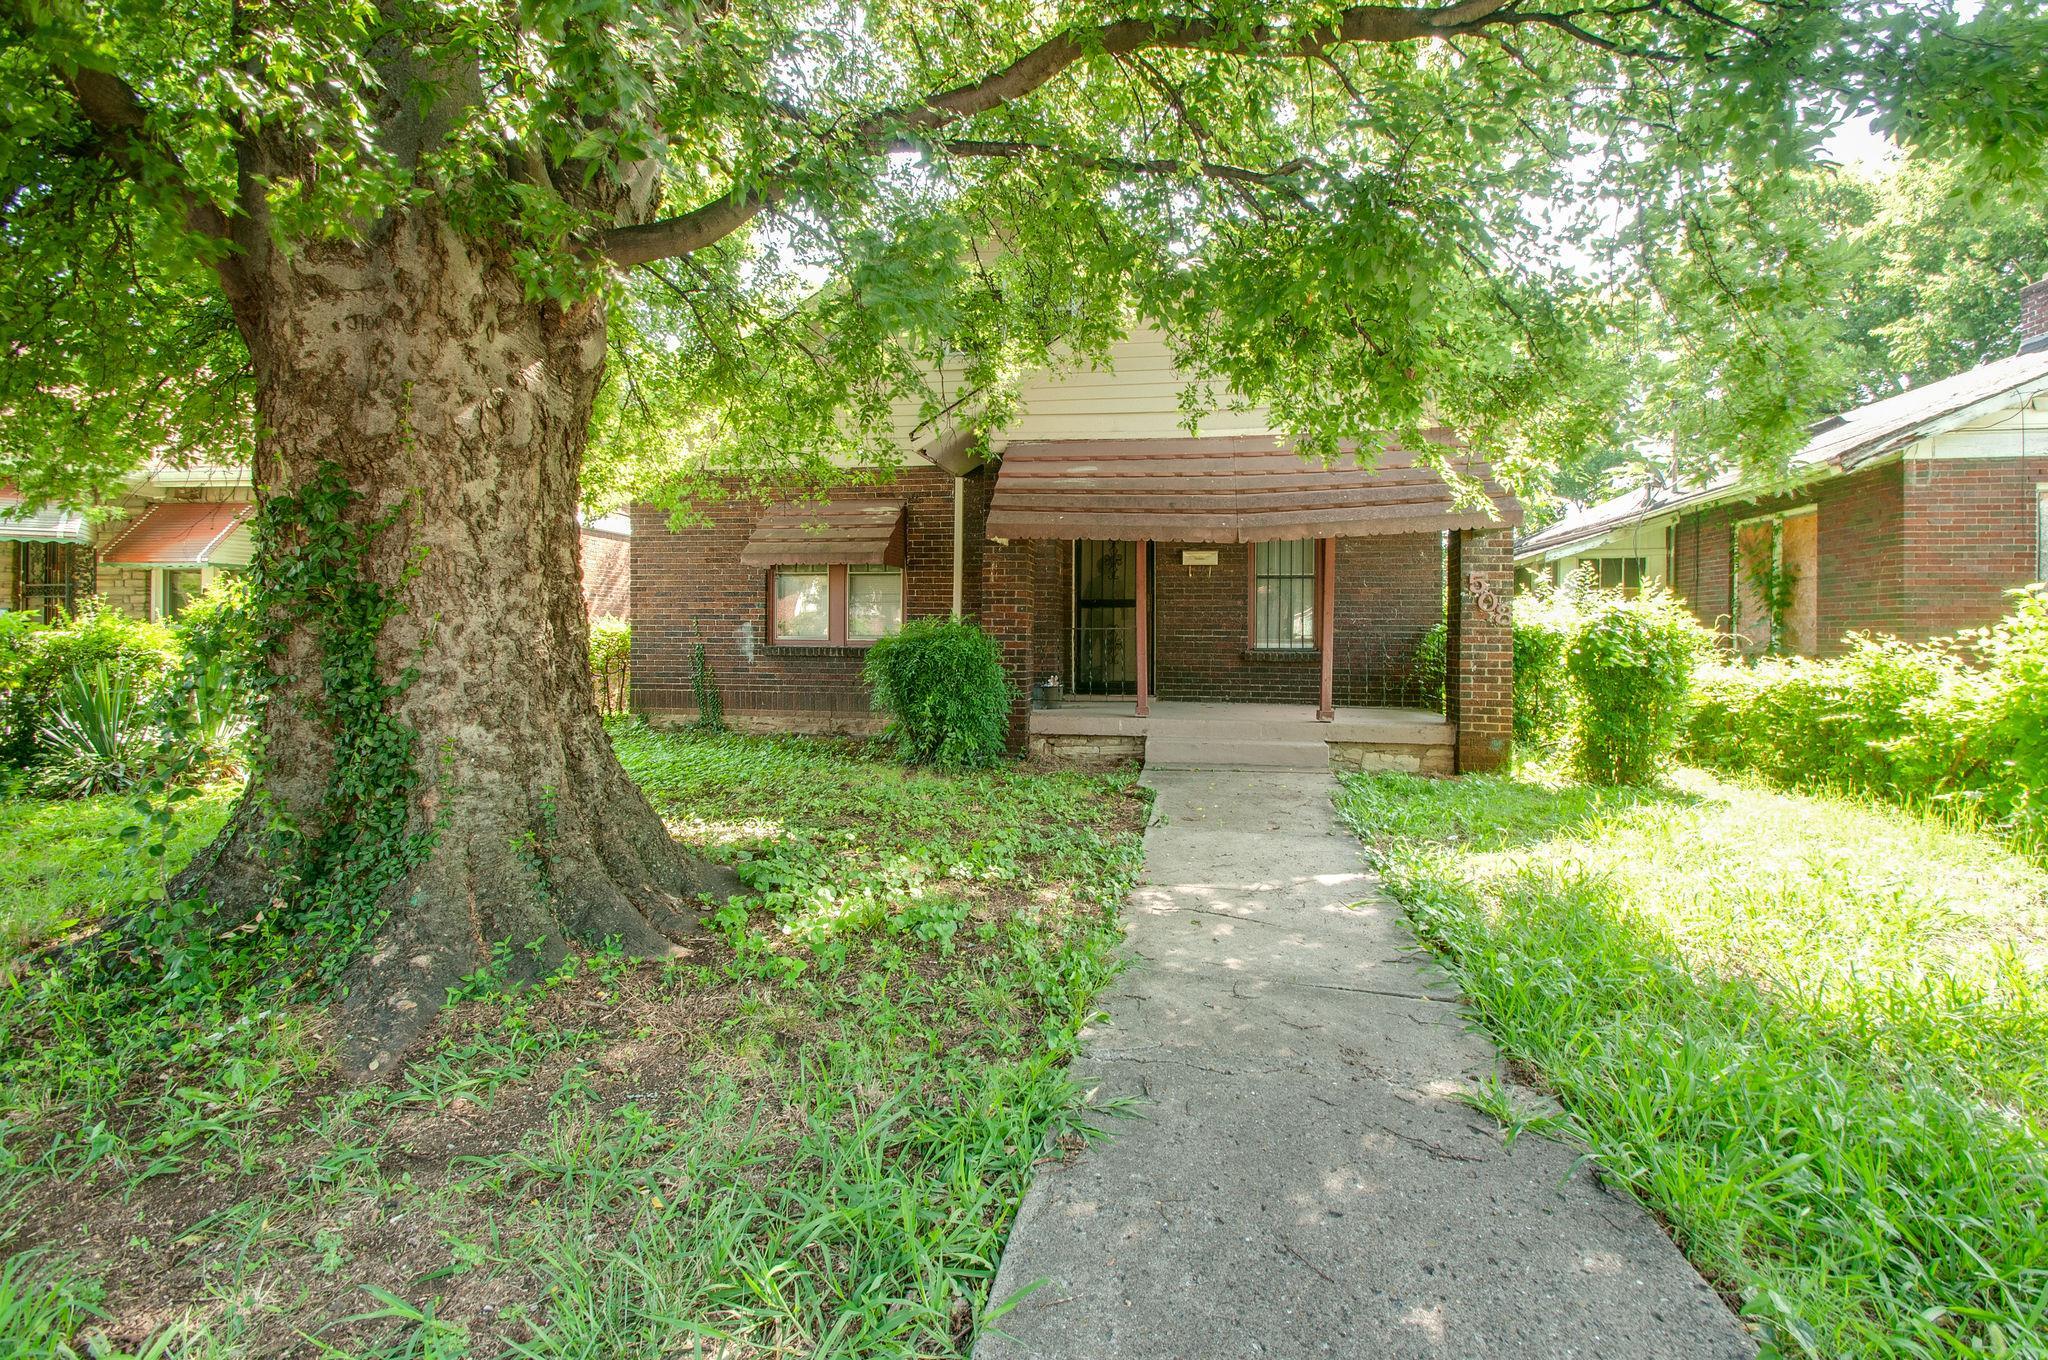 508 19Th Ave N, Nashville, TN 37203 - Nashville, TN real estate listing